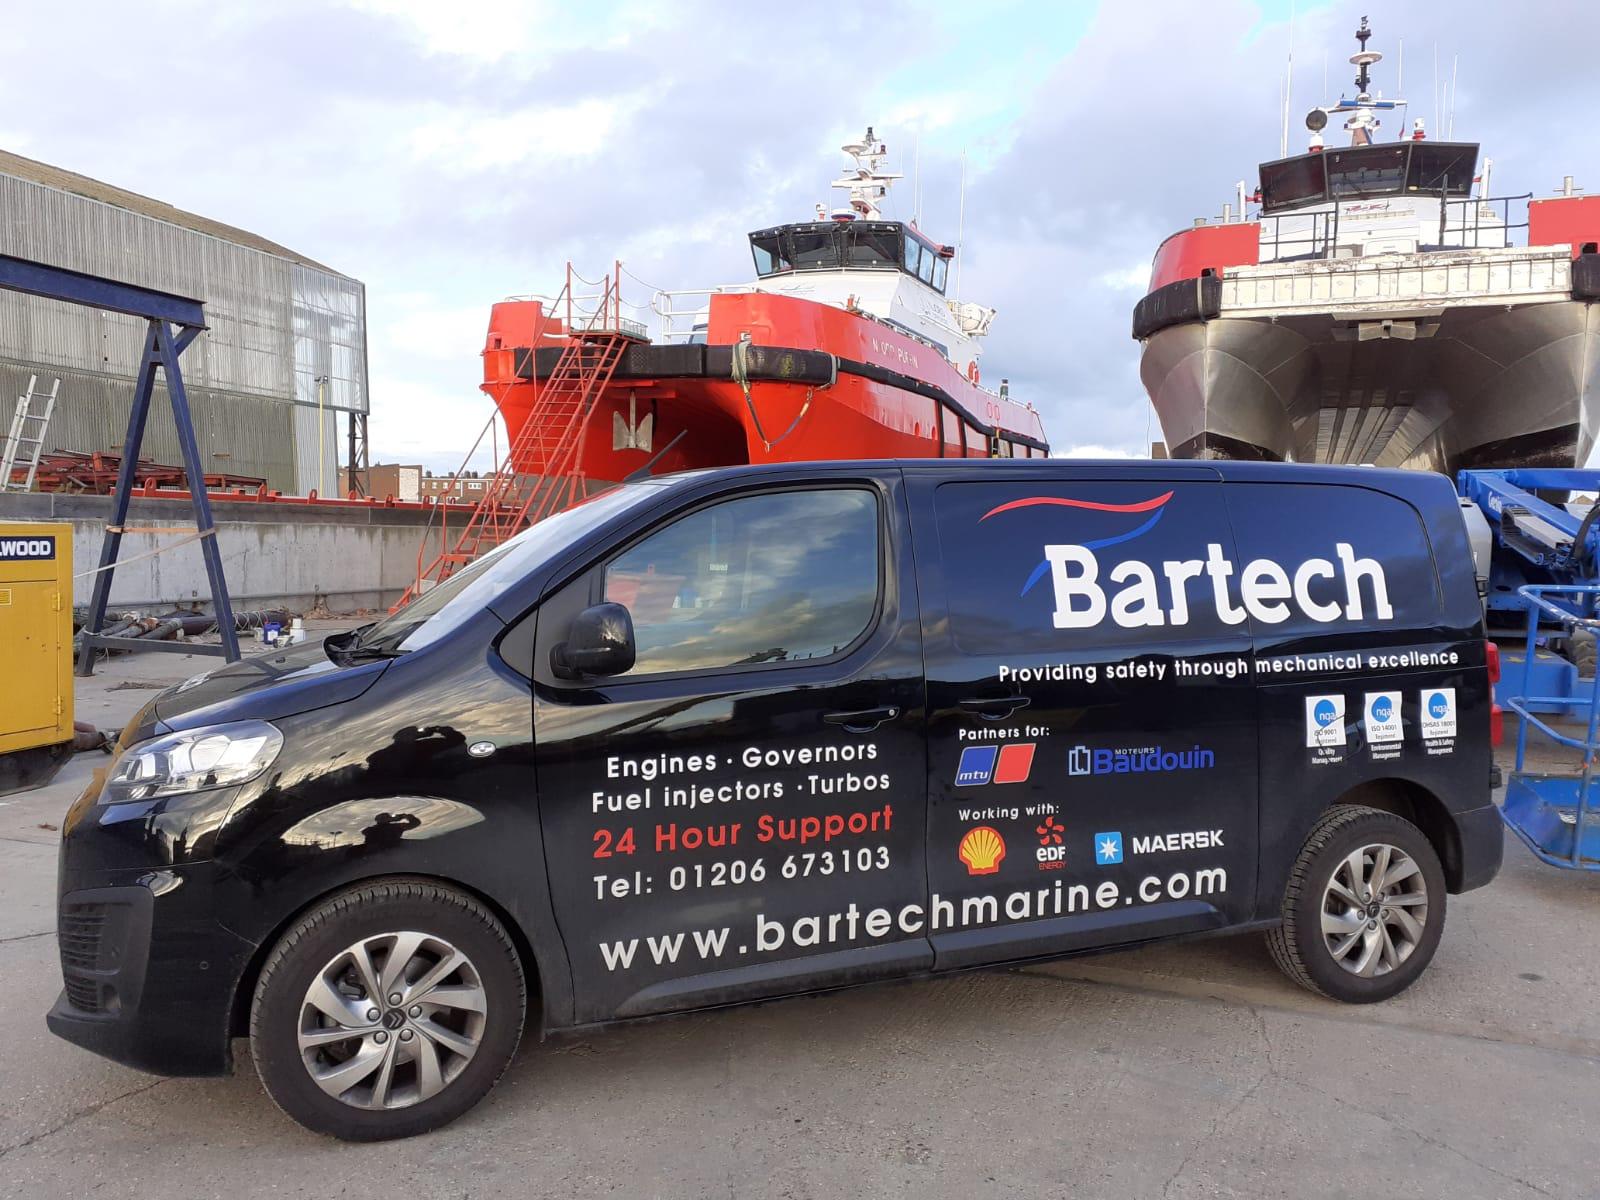 Bartech breakdown response